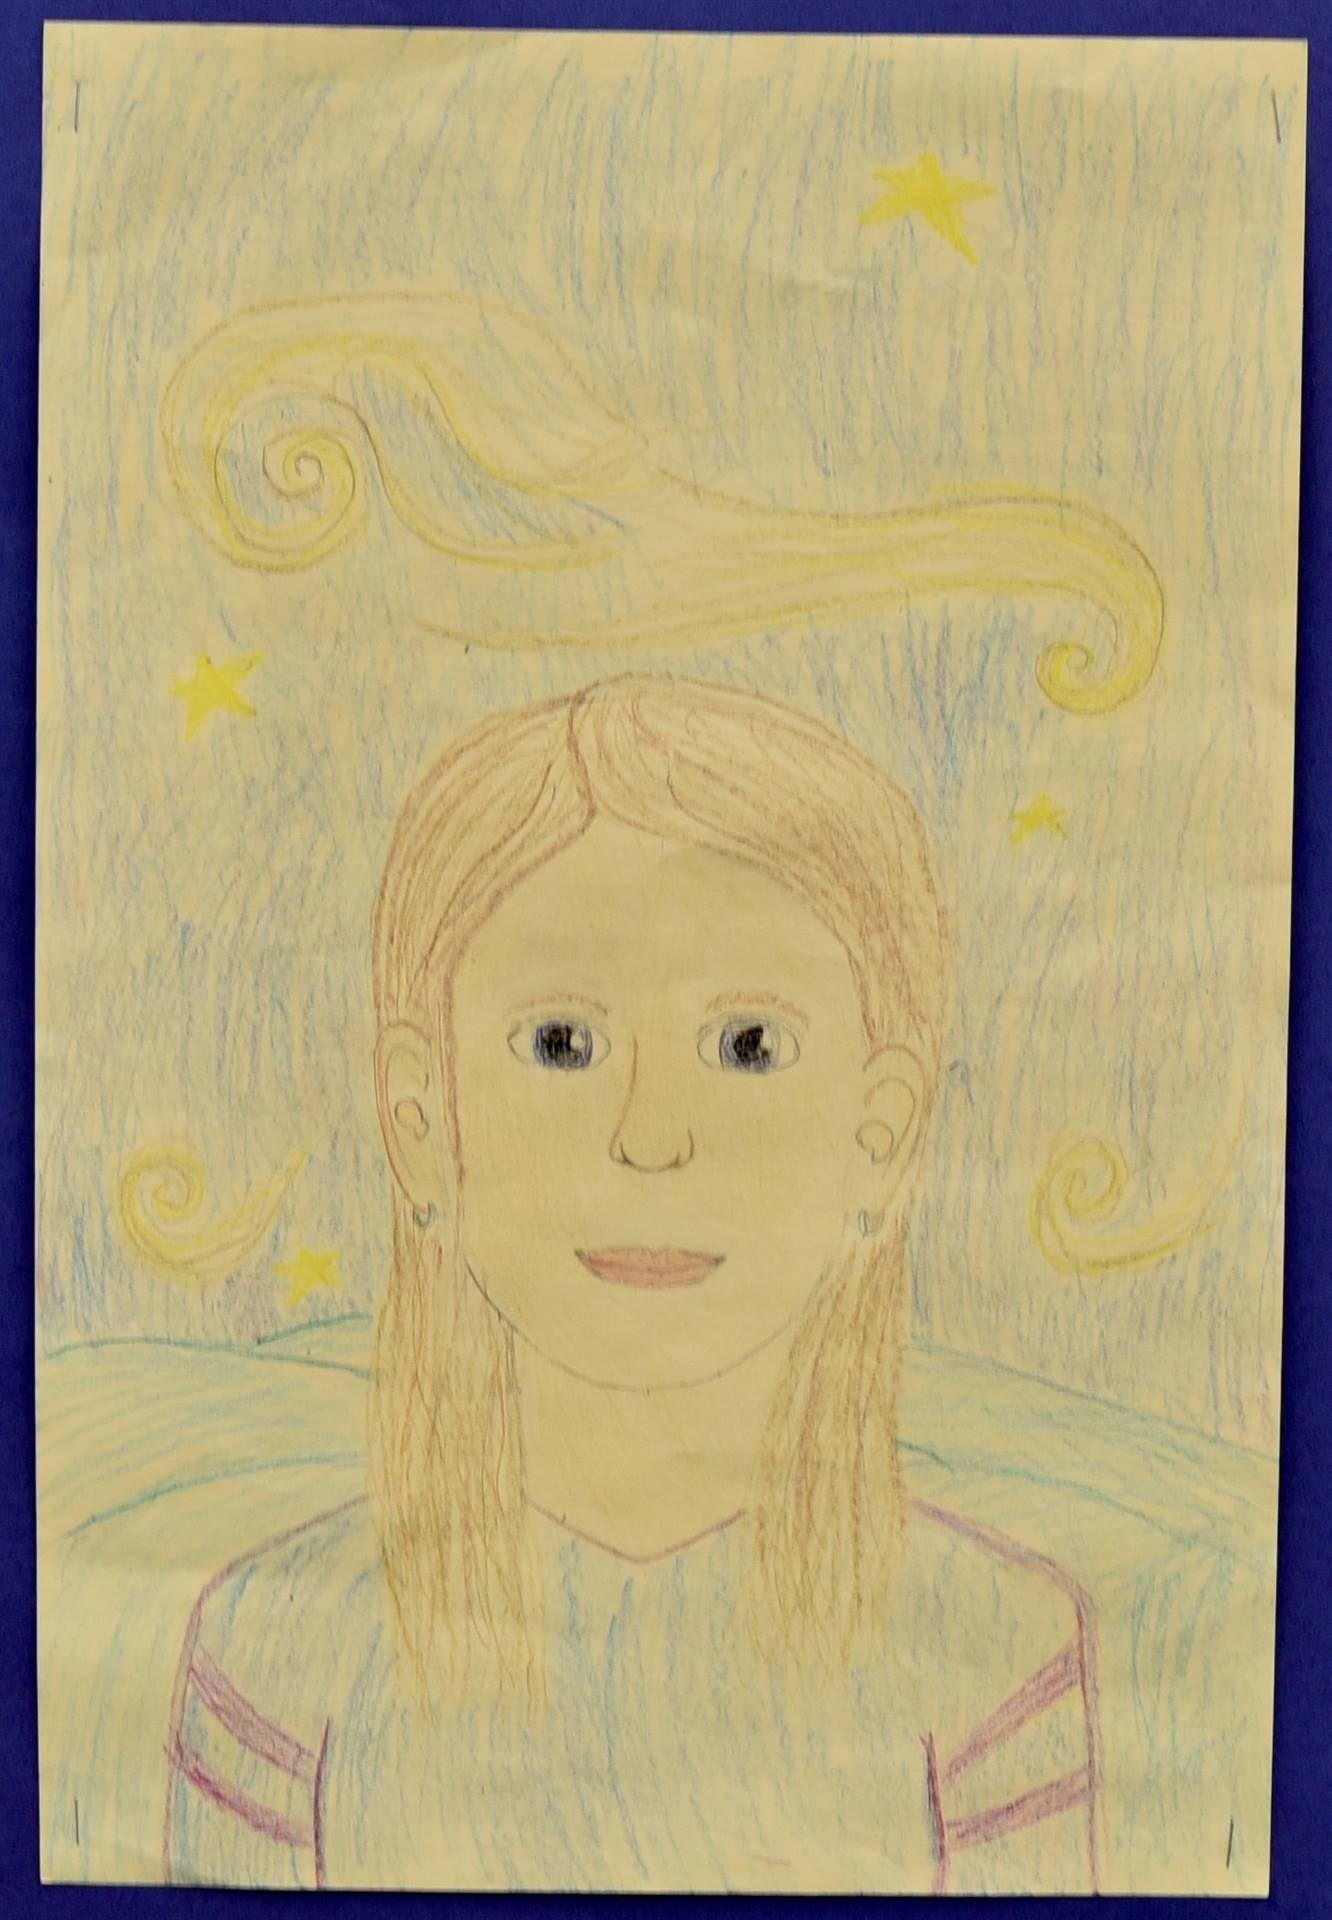 Brecksville-Broadview Hts. Middle School Art Projects 180